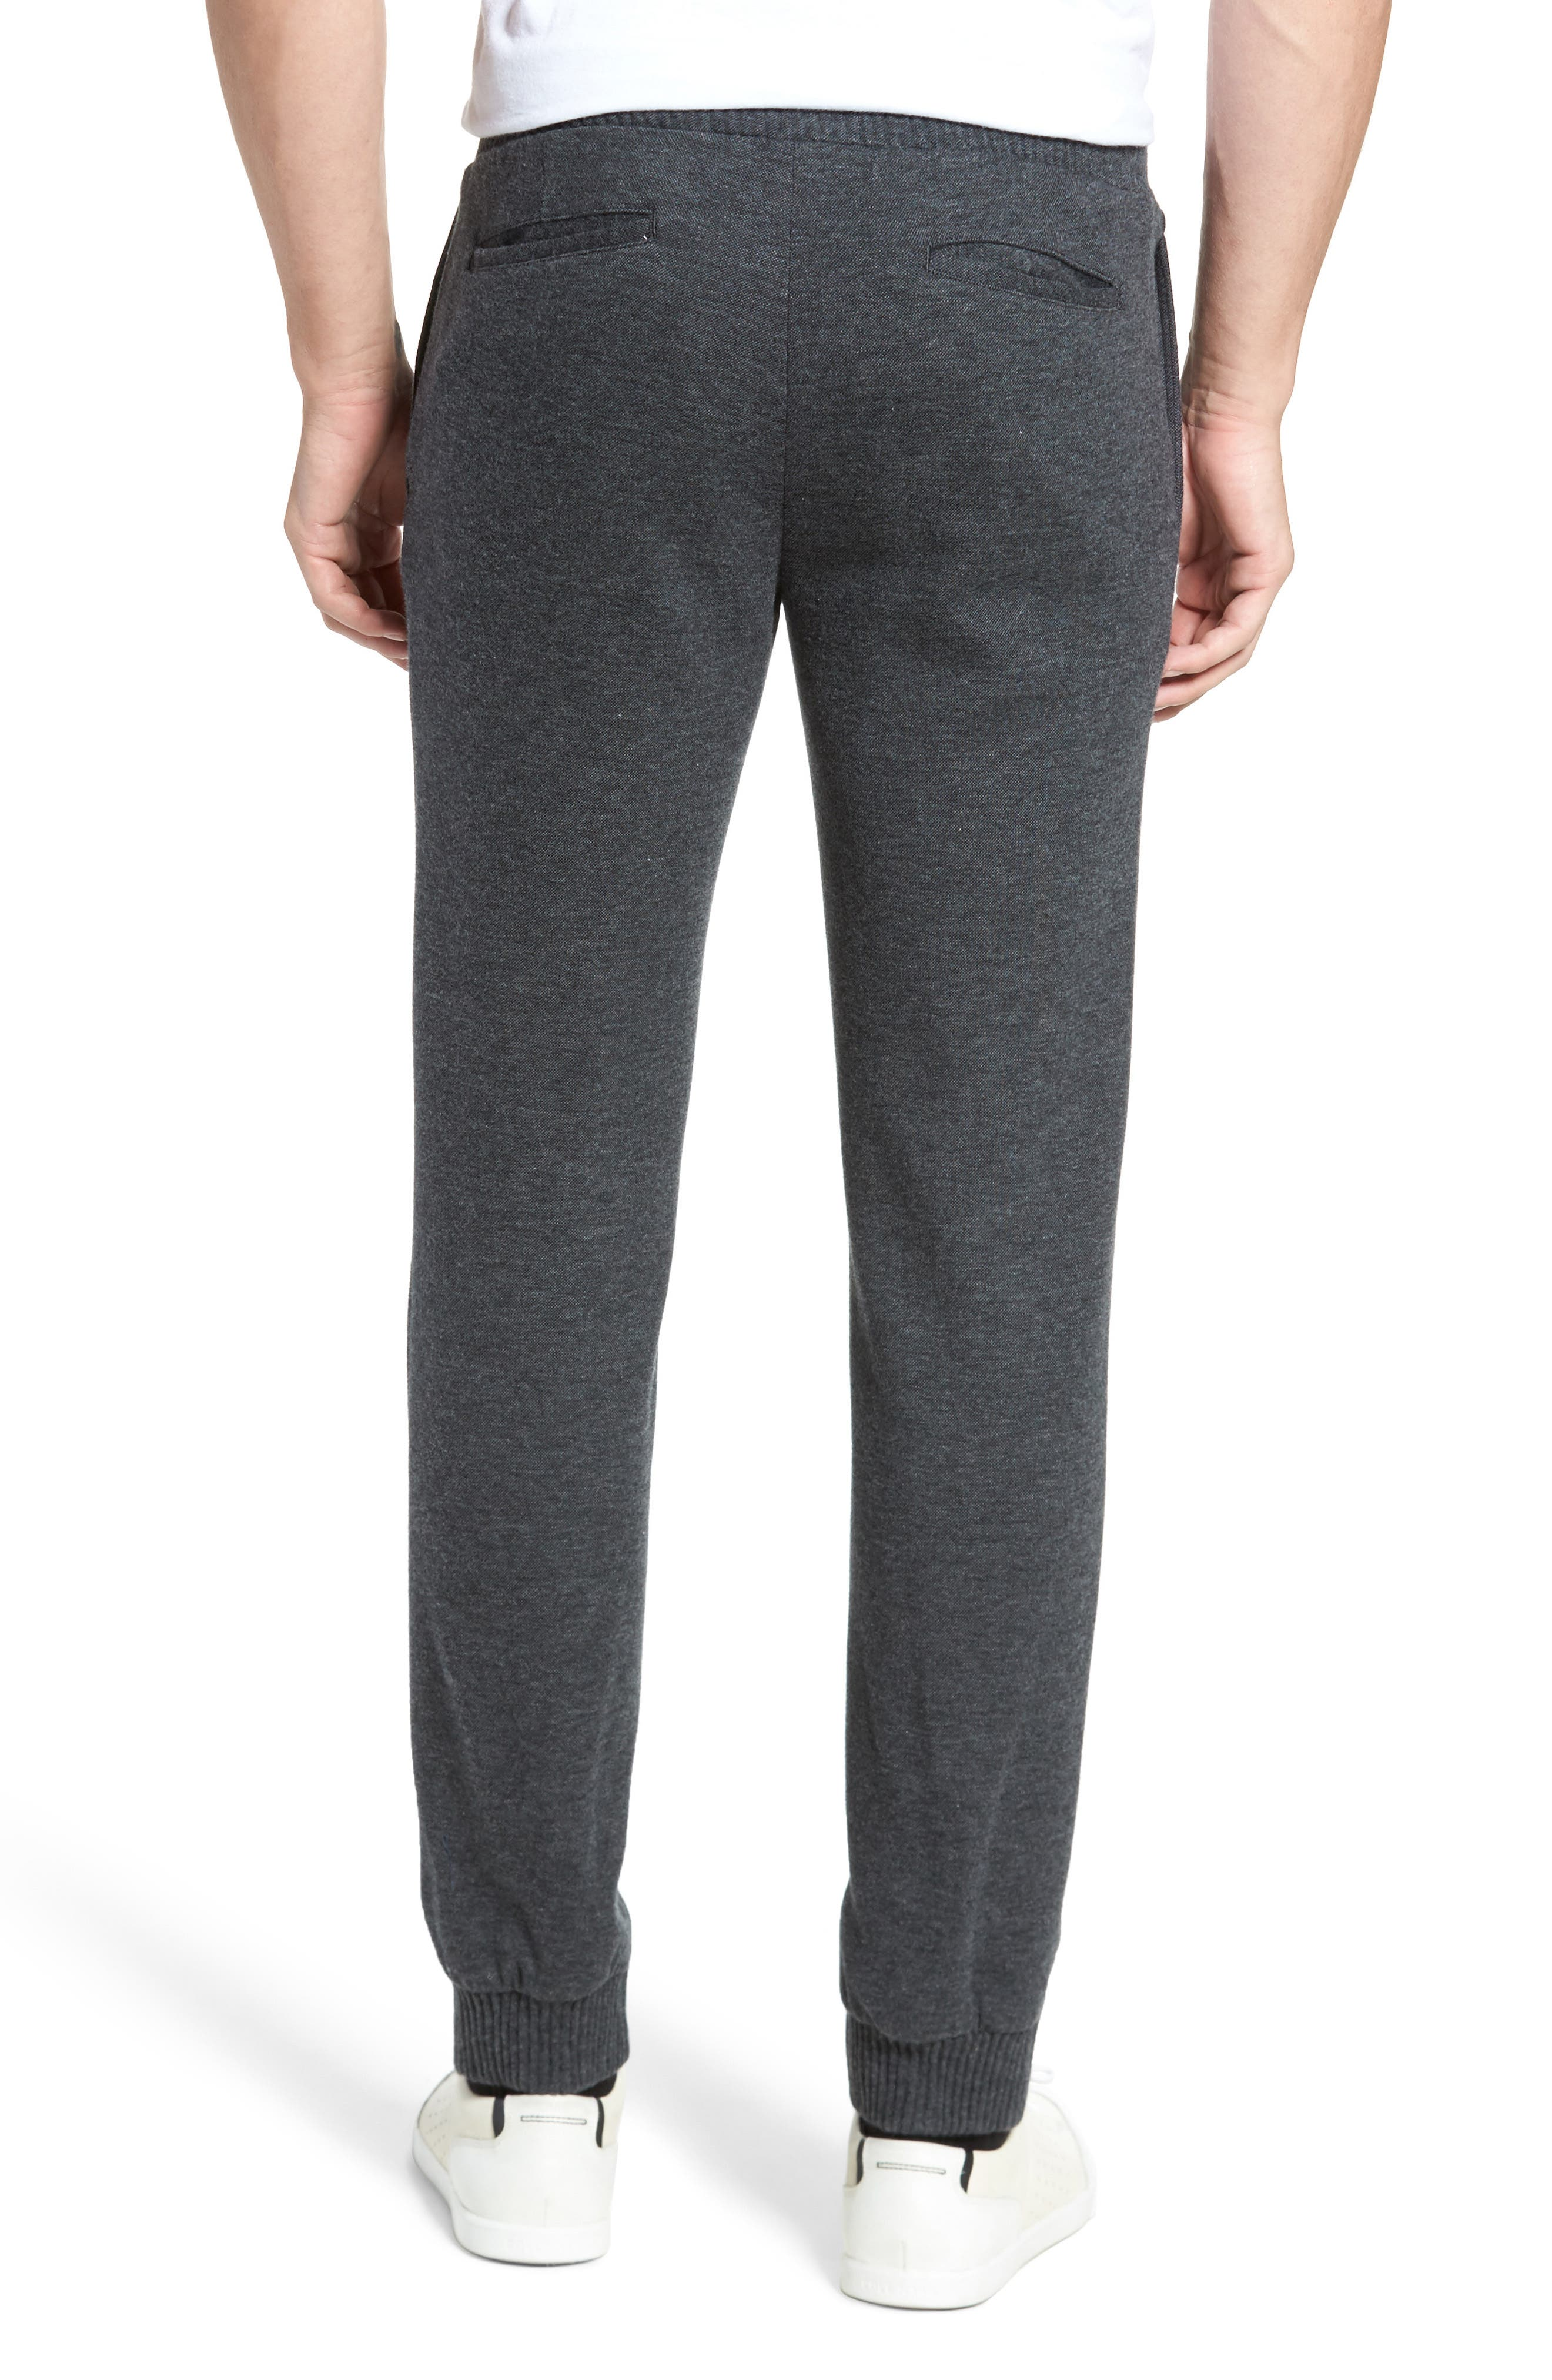 Jordan Flat Front Cotton Jogger Trousers,                             Alternate thumbnail 2, color,                             Medium Grey